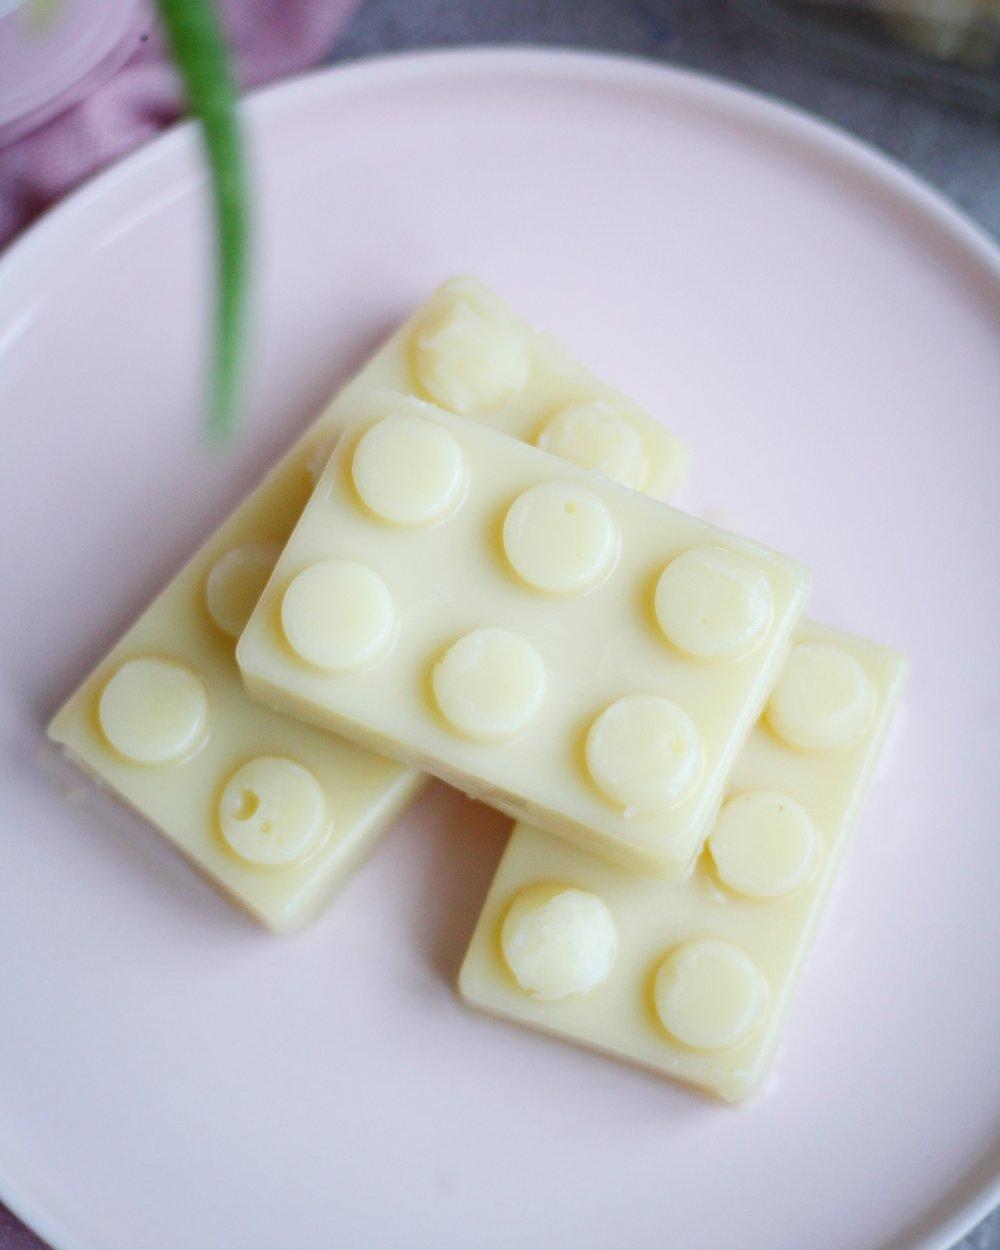 göra egna lotion bars